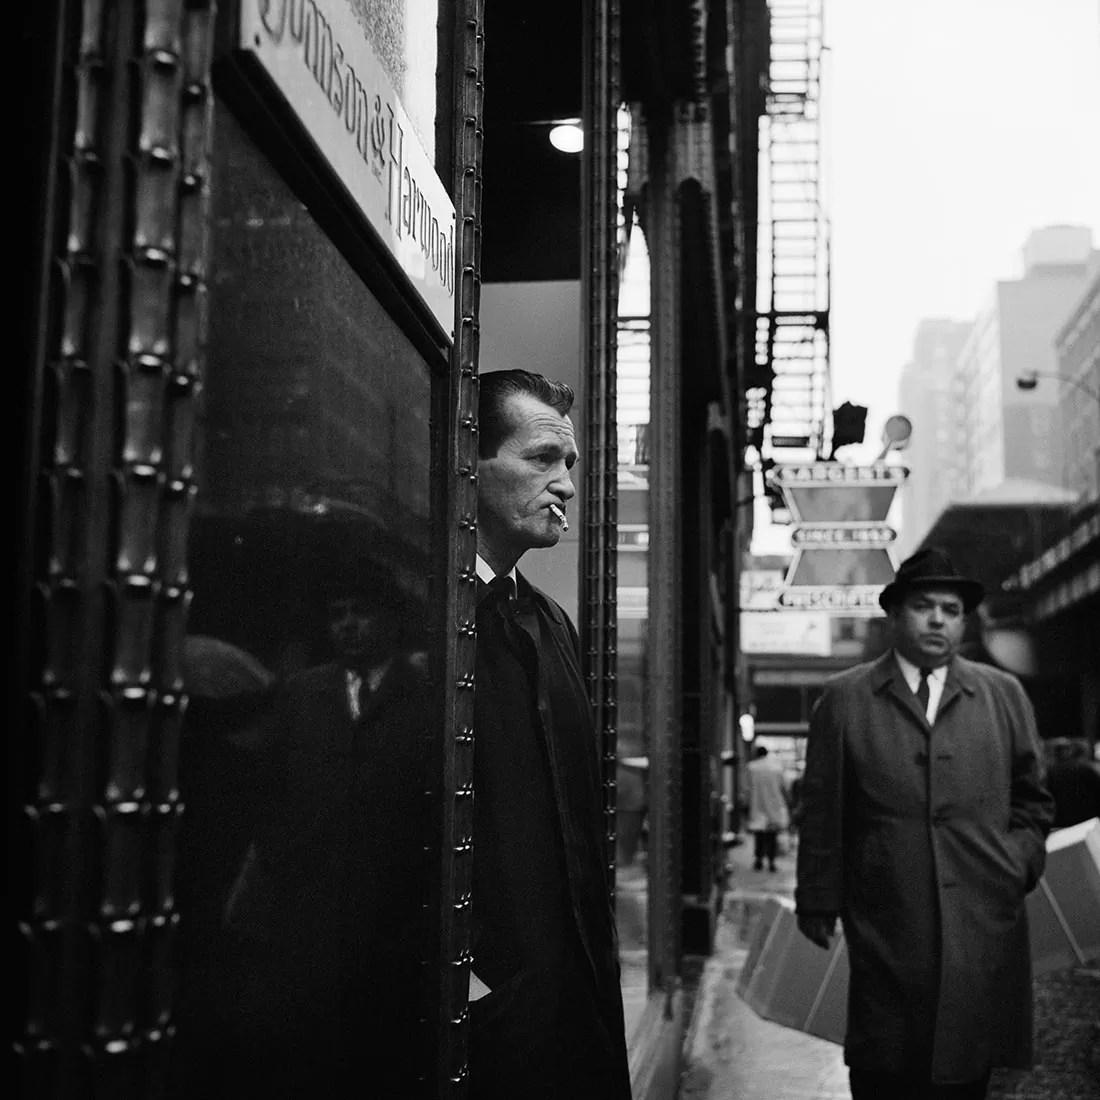 VM1966W01174 04 MC - Una storia Meravigliosa: Vivian Maier (Street Photography) - fotostreet.it